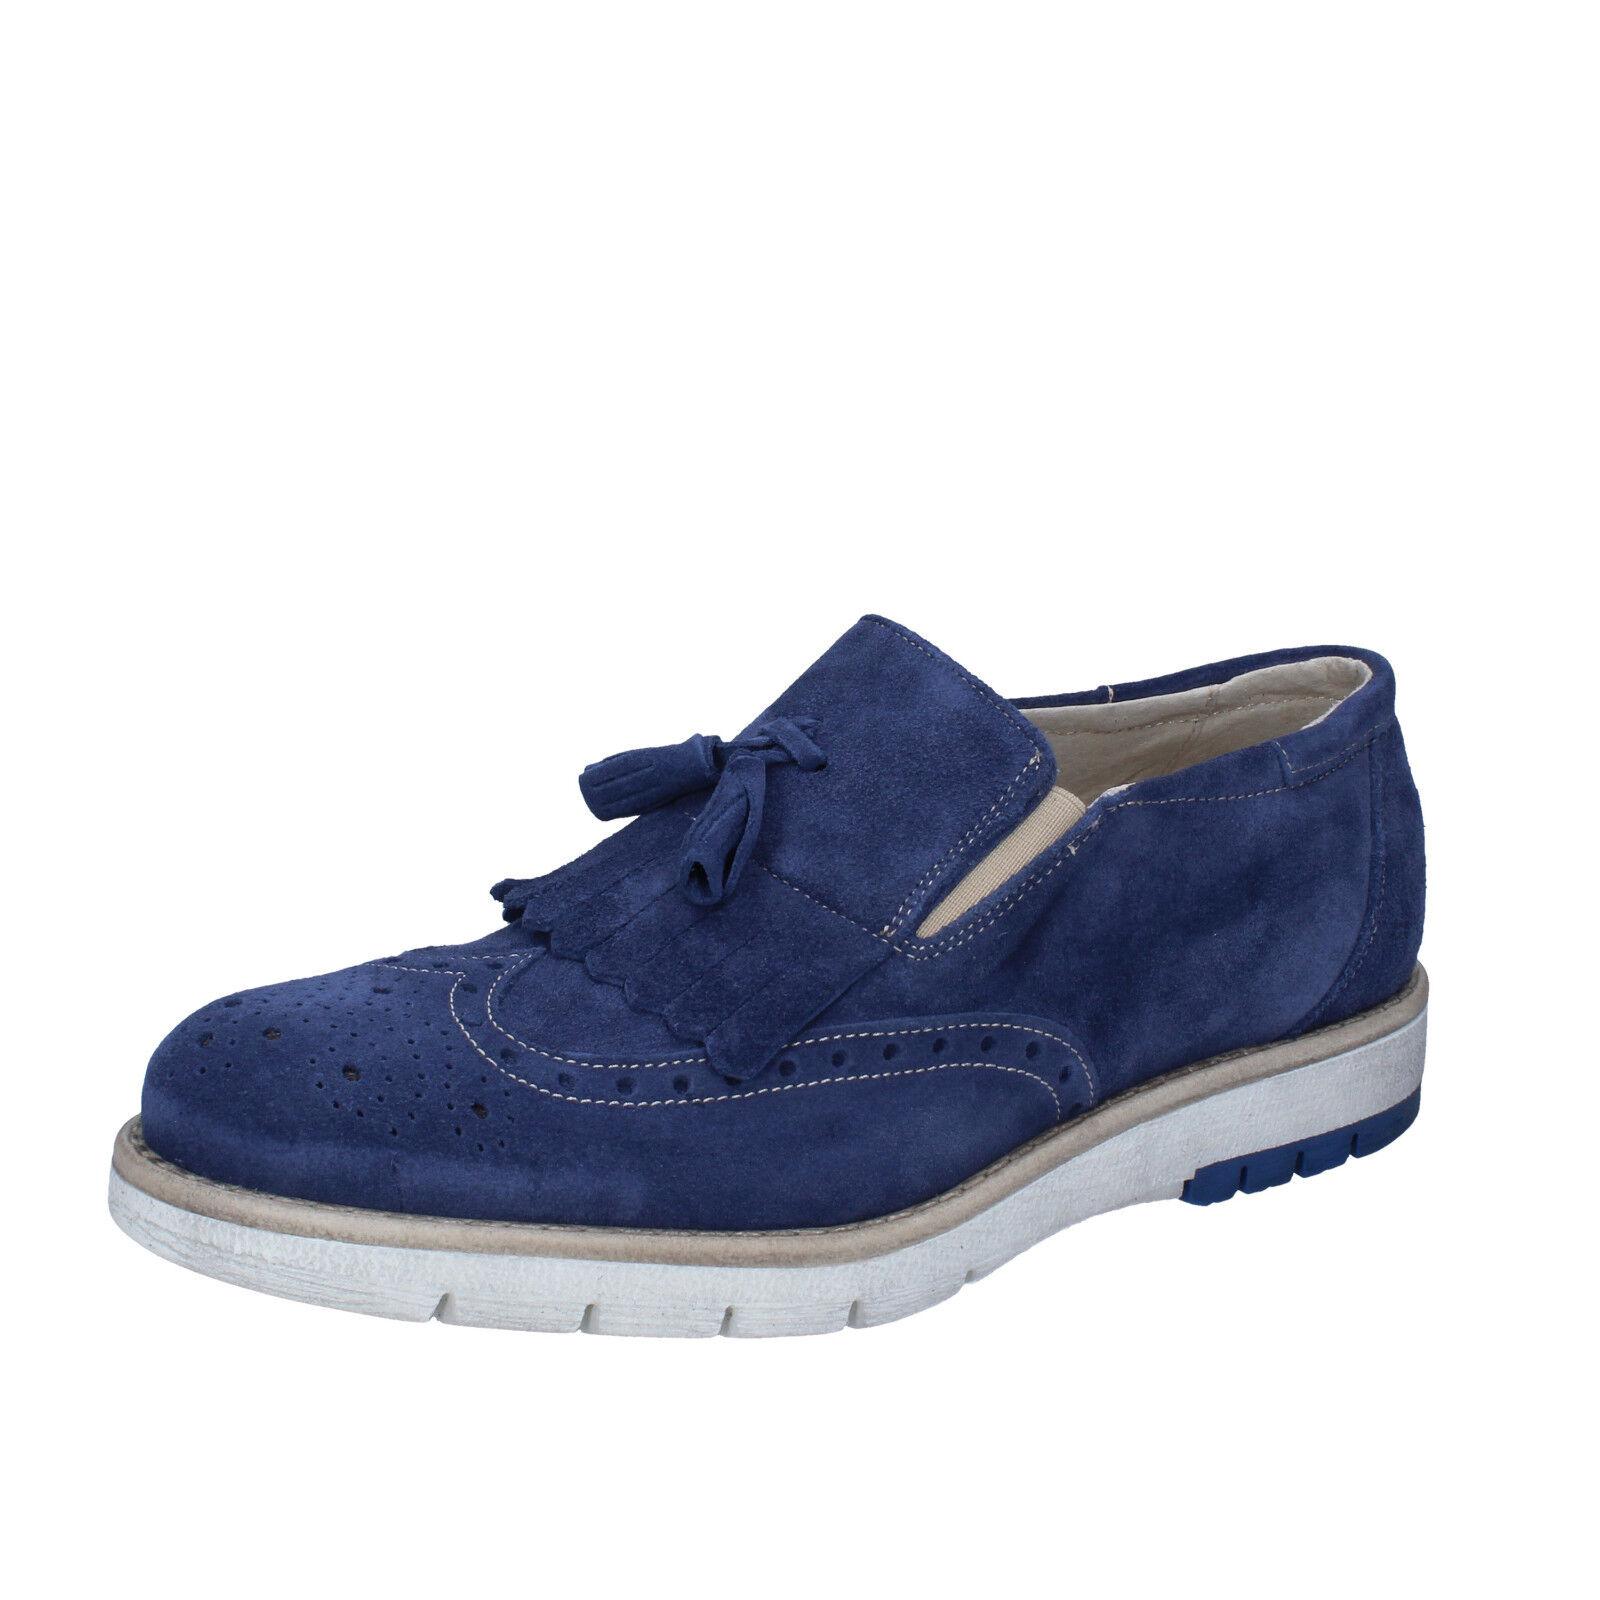 Mens shoes KEP'S 8 () elegant bluee suede BZ886-42